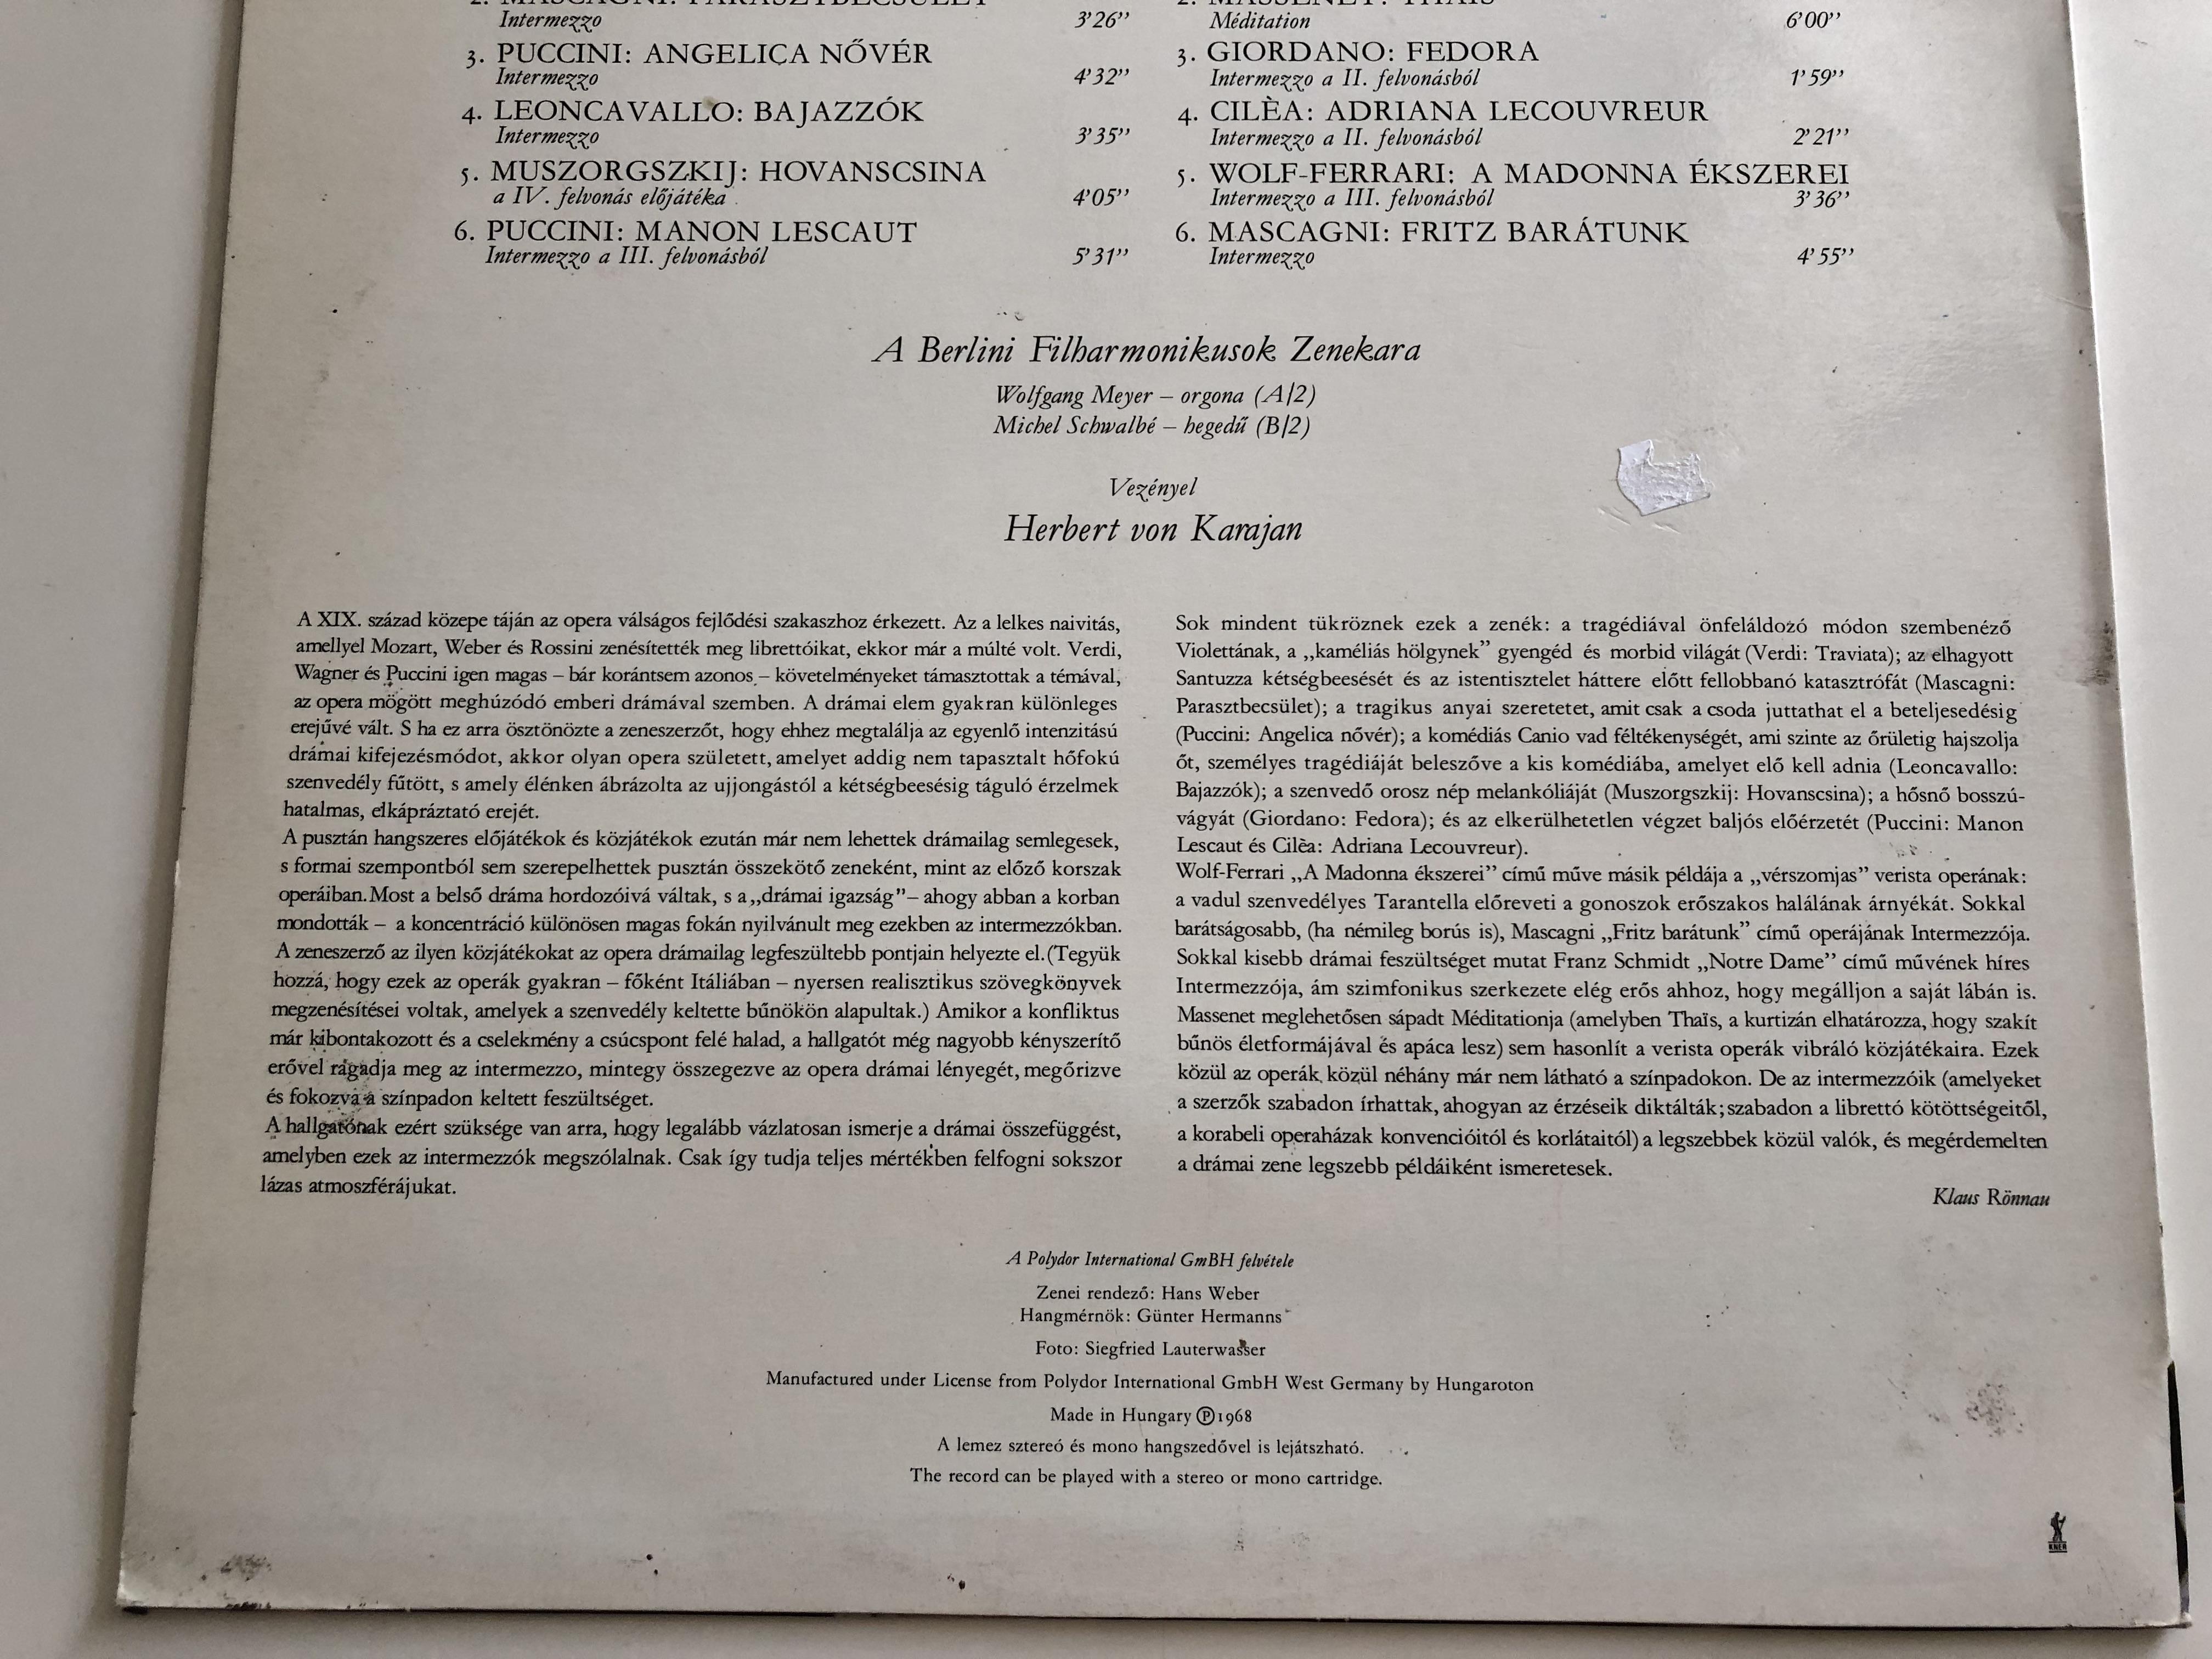 intermezzo-k-zj-t-kok-n-pszer-oper-kb-l-a-berlini-filharmonikusok-zenekara-herbert-von-karajan-hungaroton-lp-stereo-slpxl-12138-5-.jpg